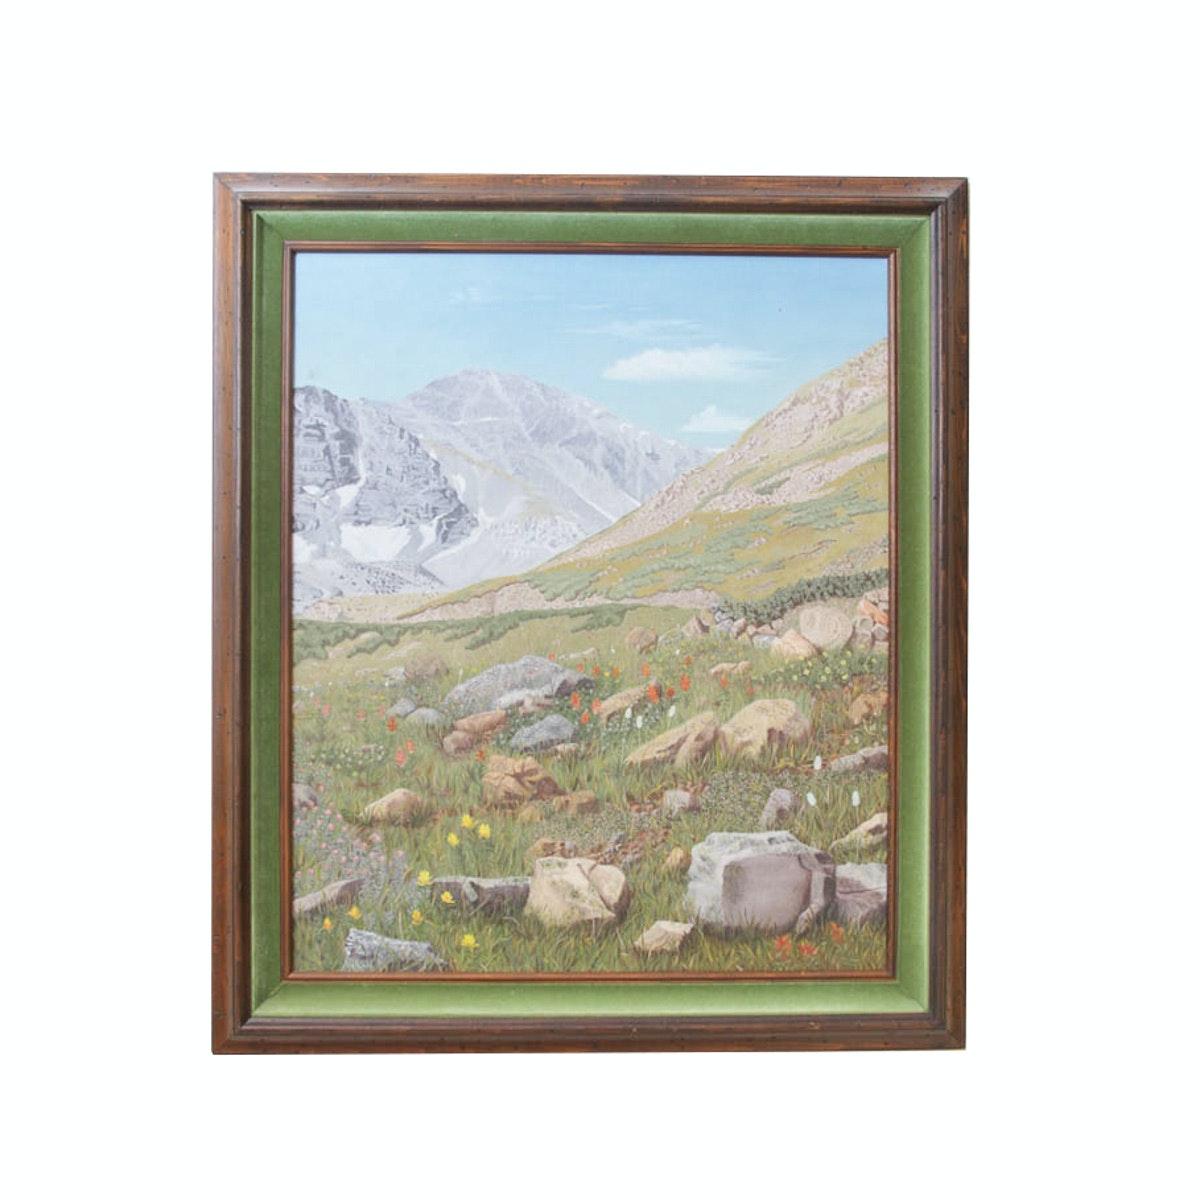 Bess Harris Original Oil Painting of a Mountain Scene